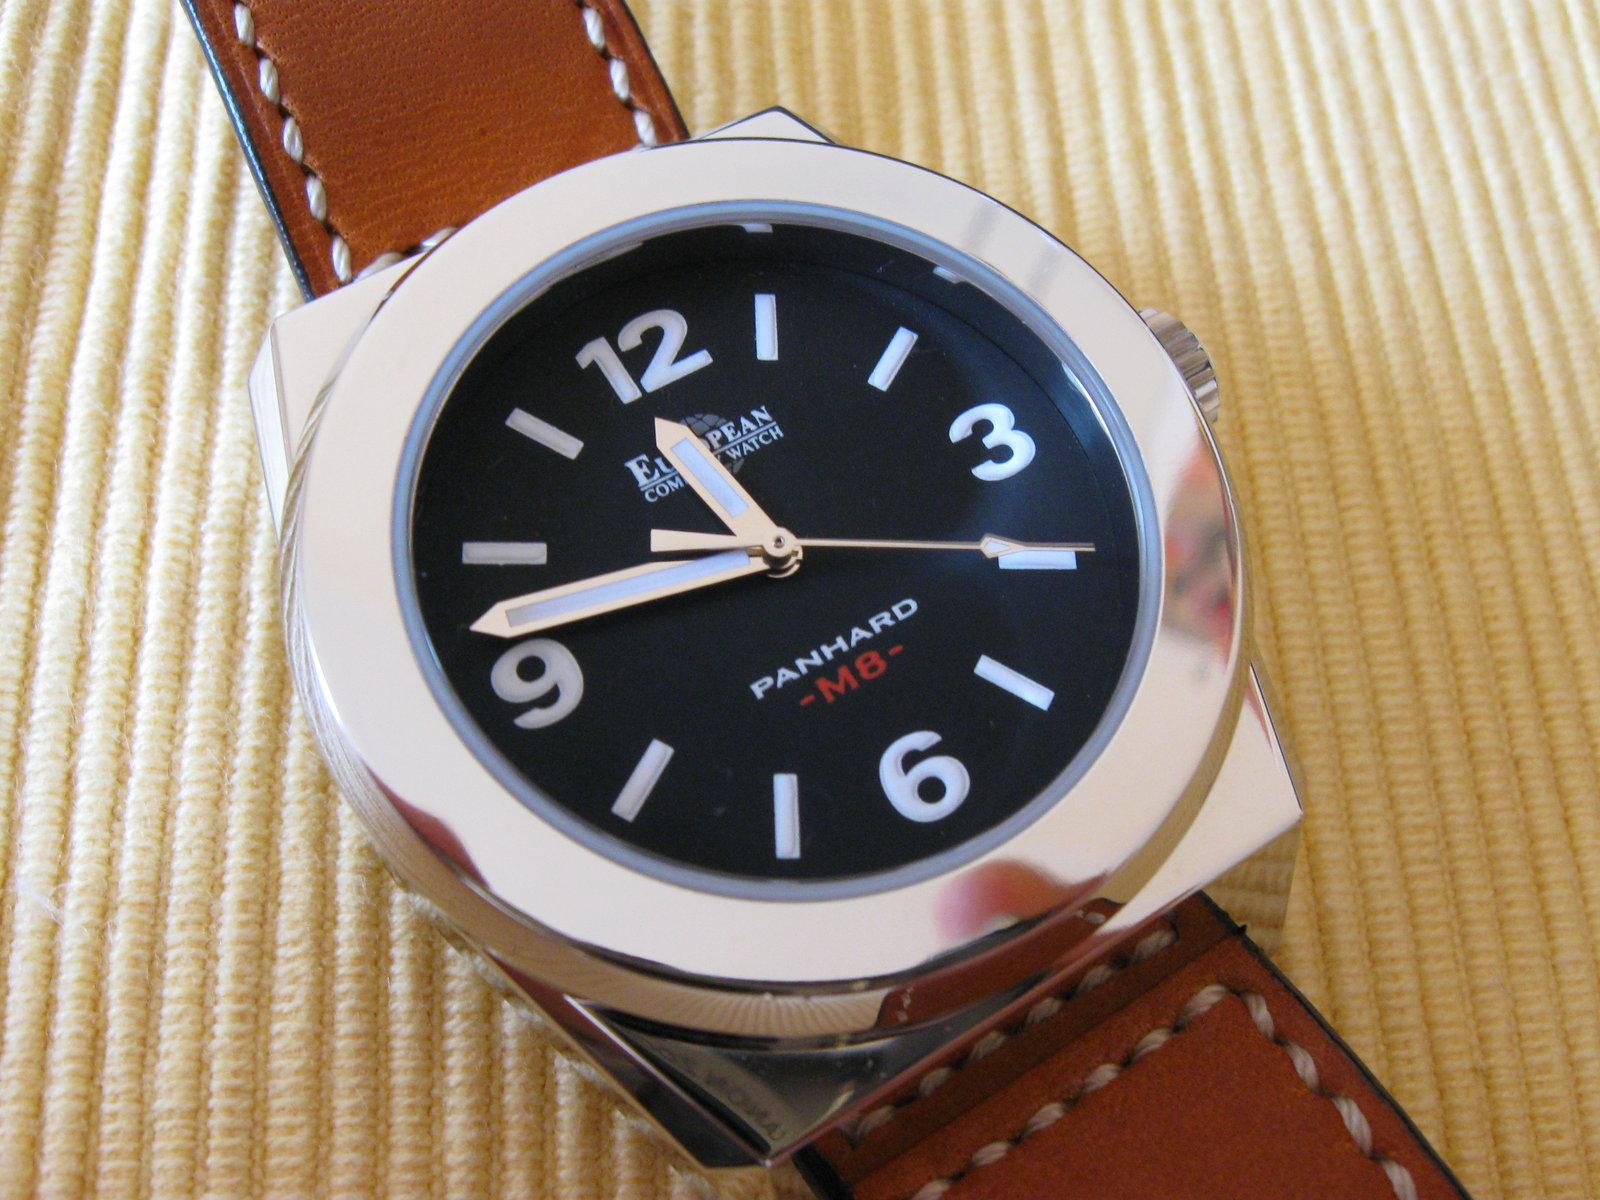 Erledigt Neuwertige European Company Watch Panhard M8